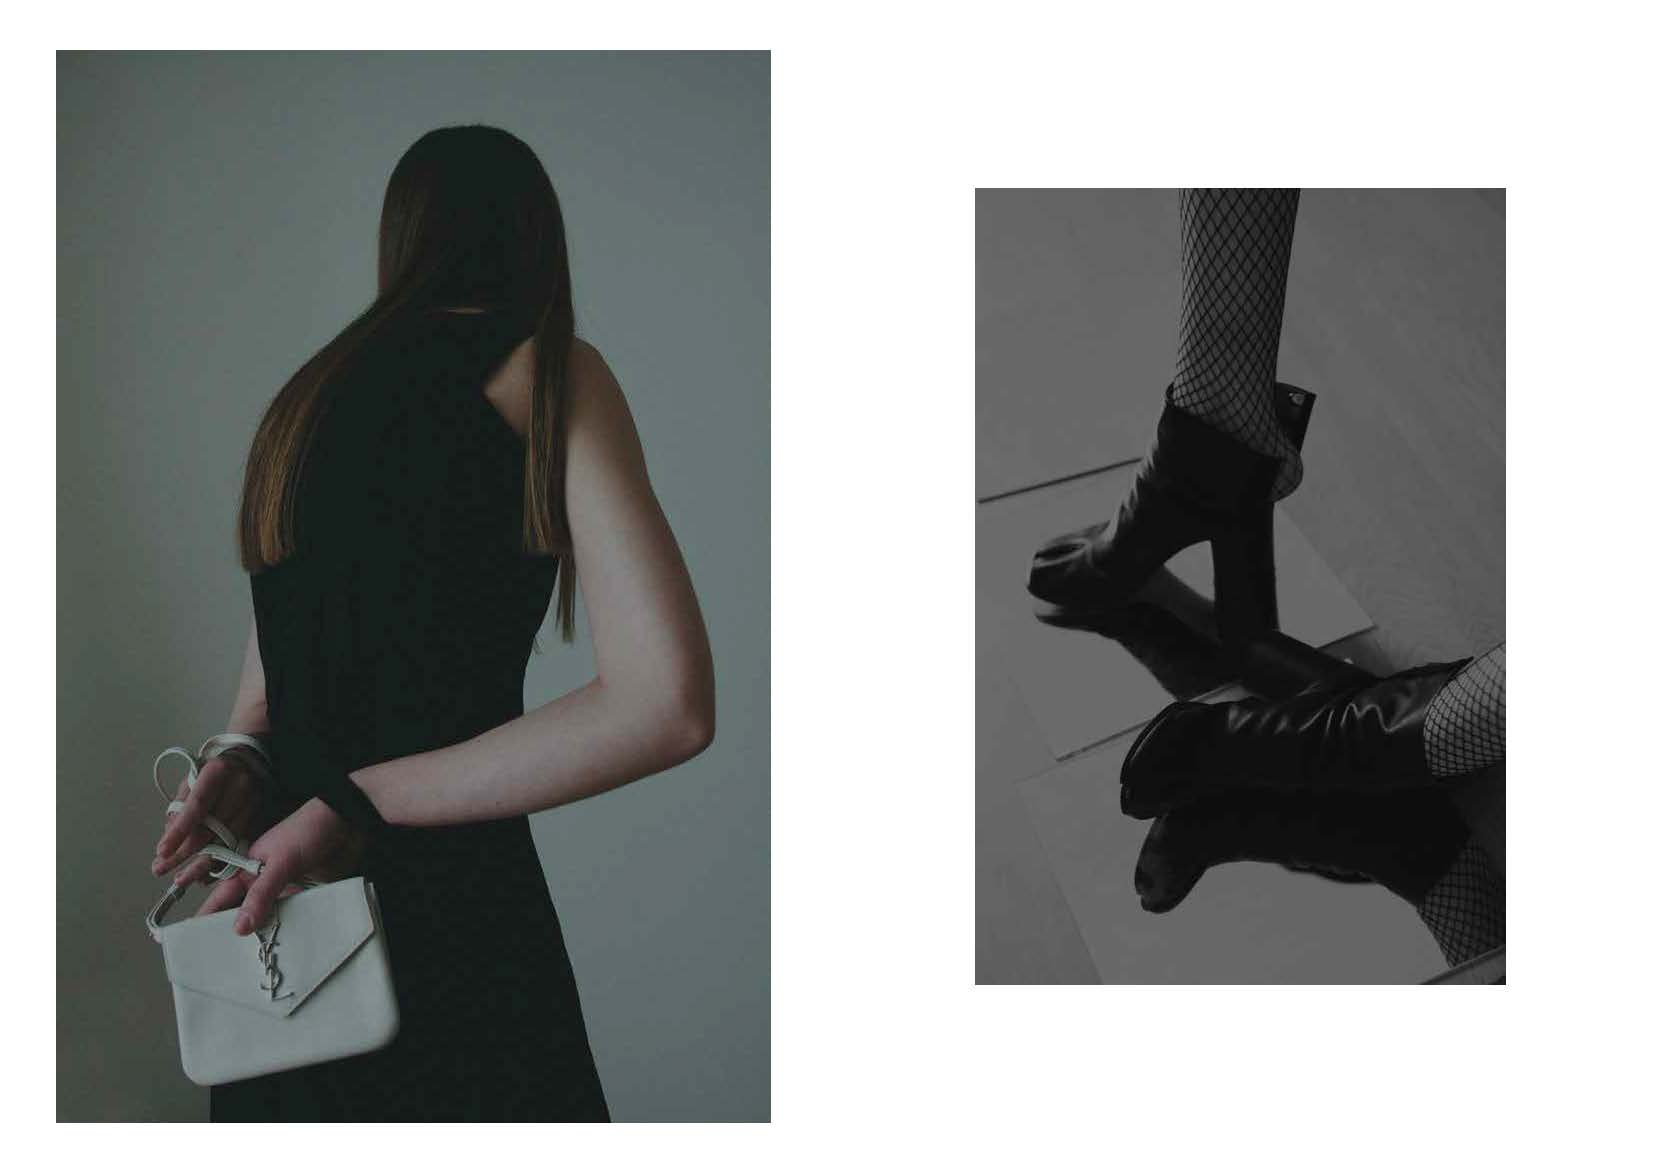 panel black dress COS, trio mini-bag SAINT LAURENT, right tabi boots MAISON MARTIN MARGIELA, fishnet stockings STYLIST ARCHIVE